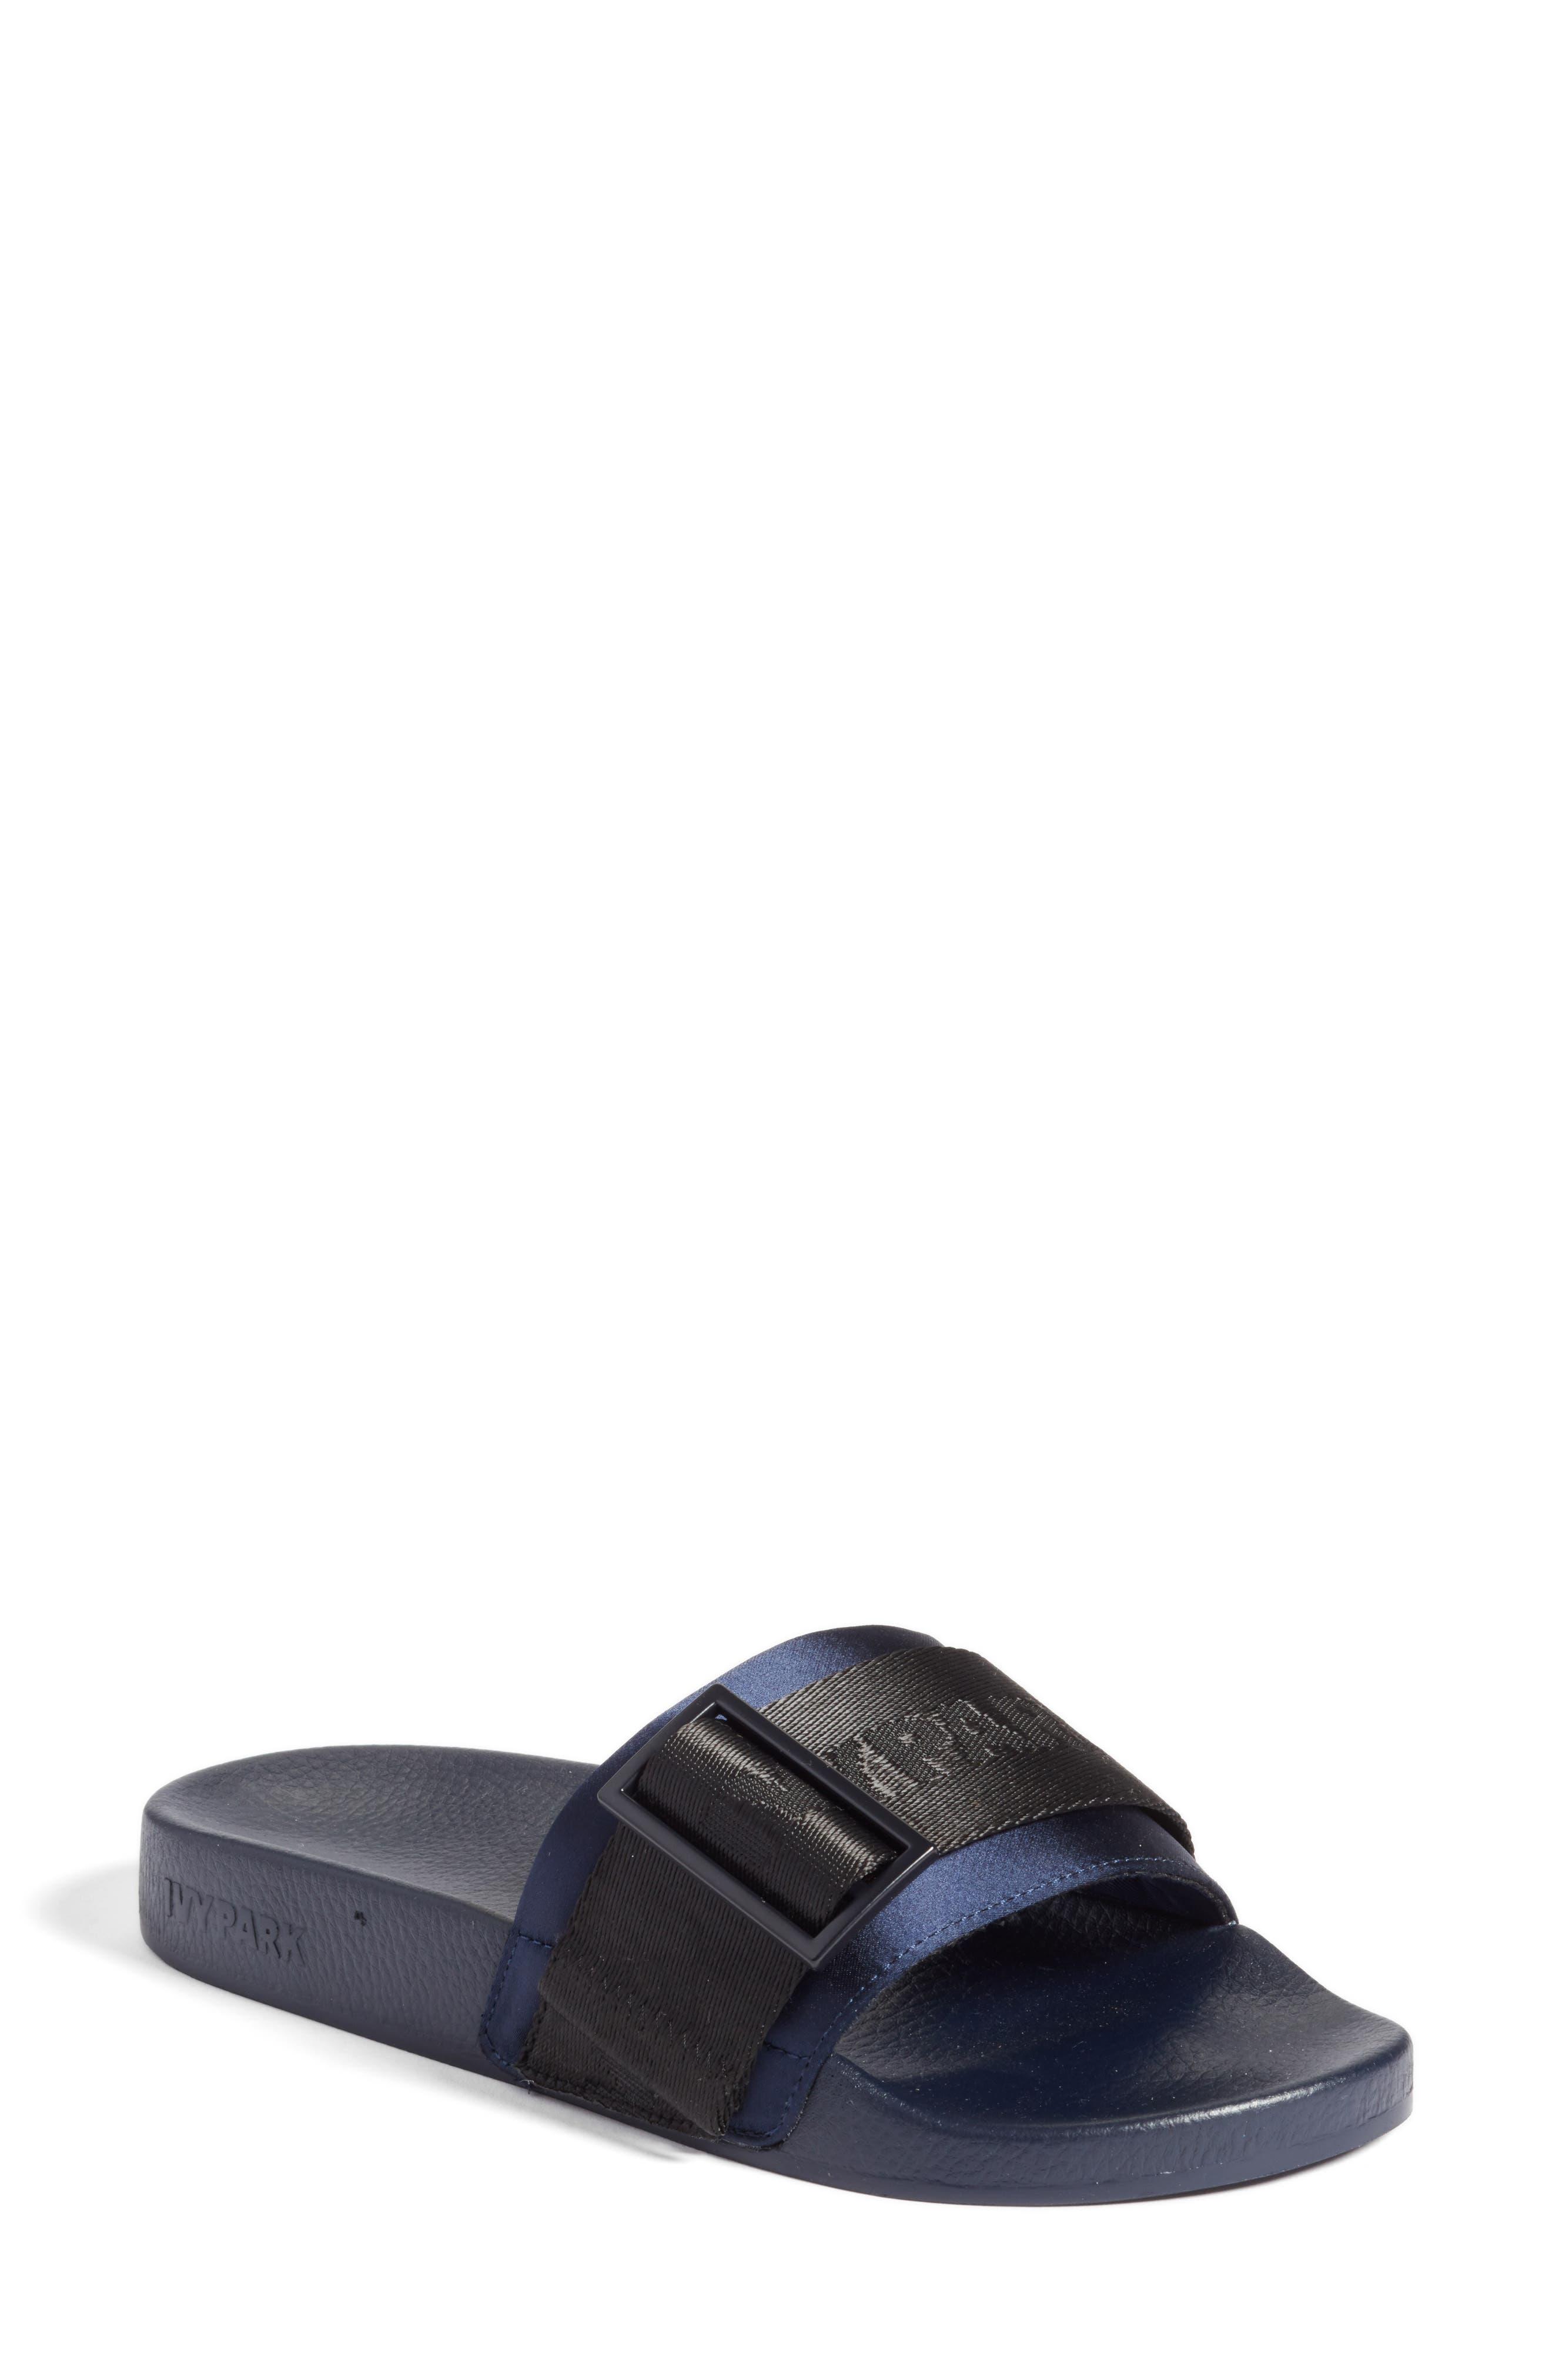 Hi-Shine Strap Slide Sandal,                             Main thumbnail 1, color,                             Ink